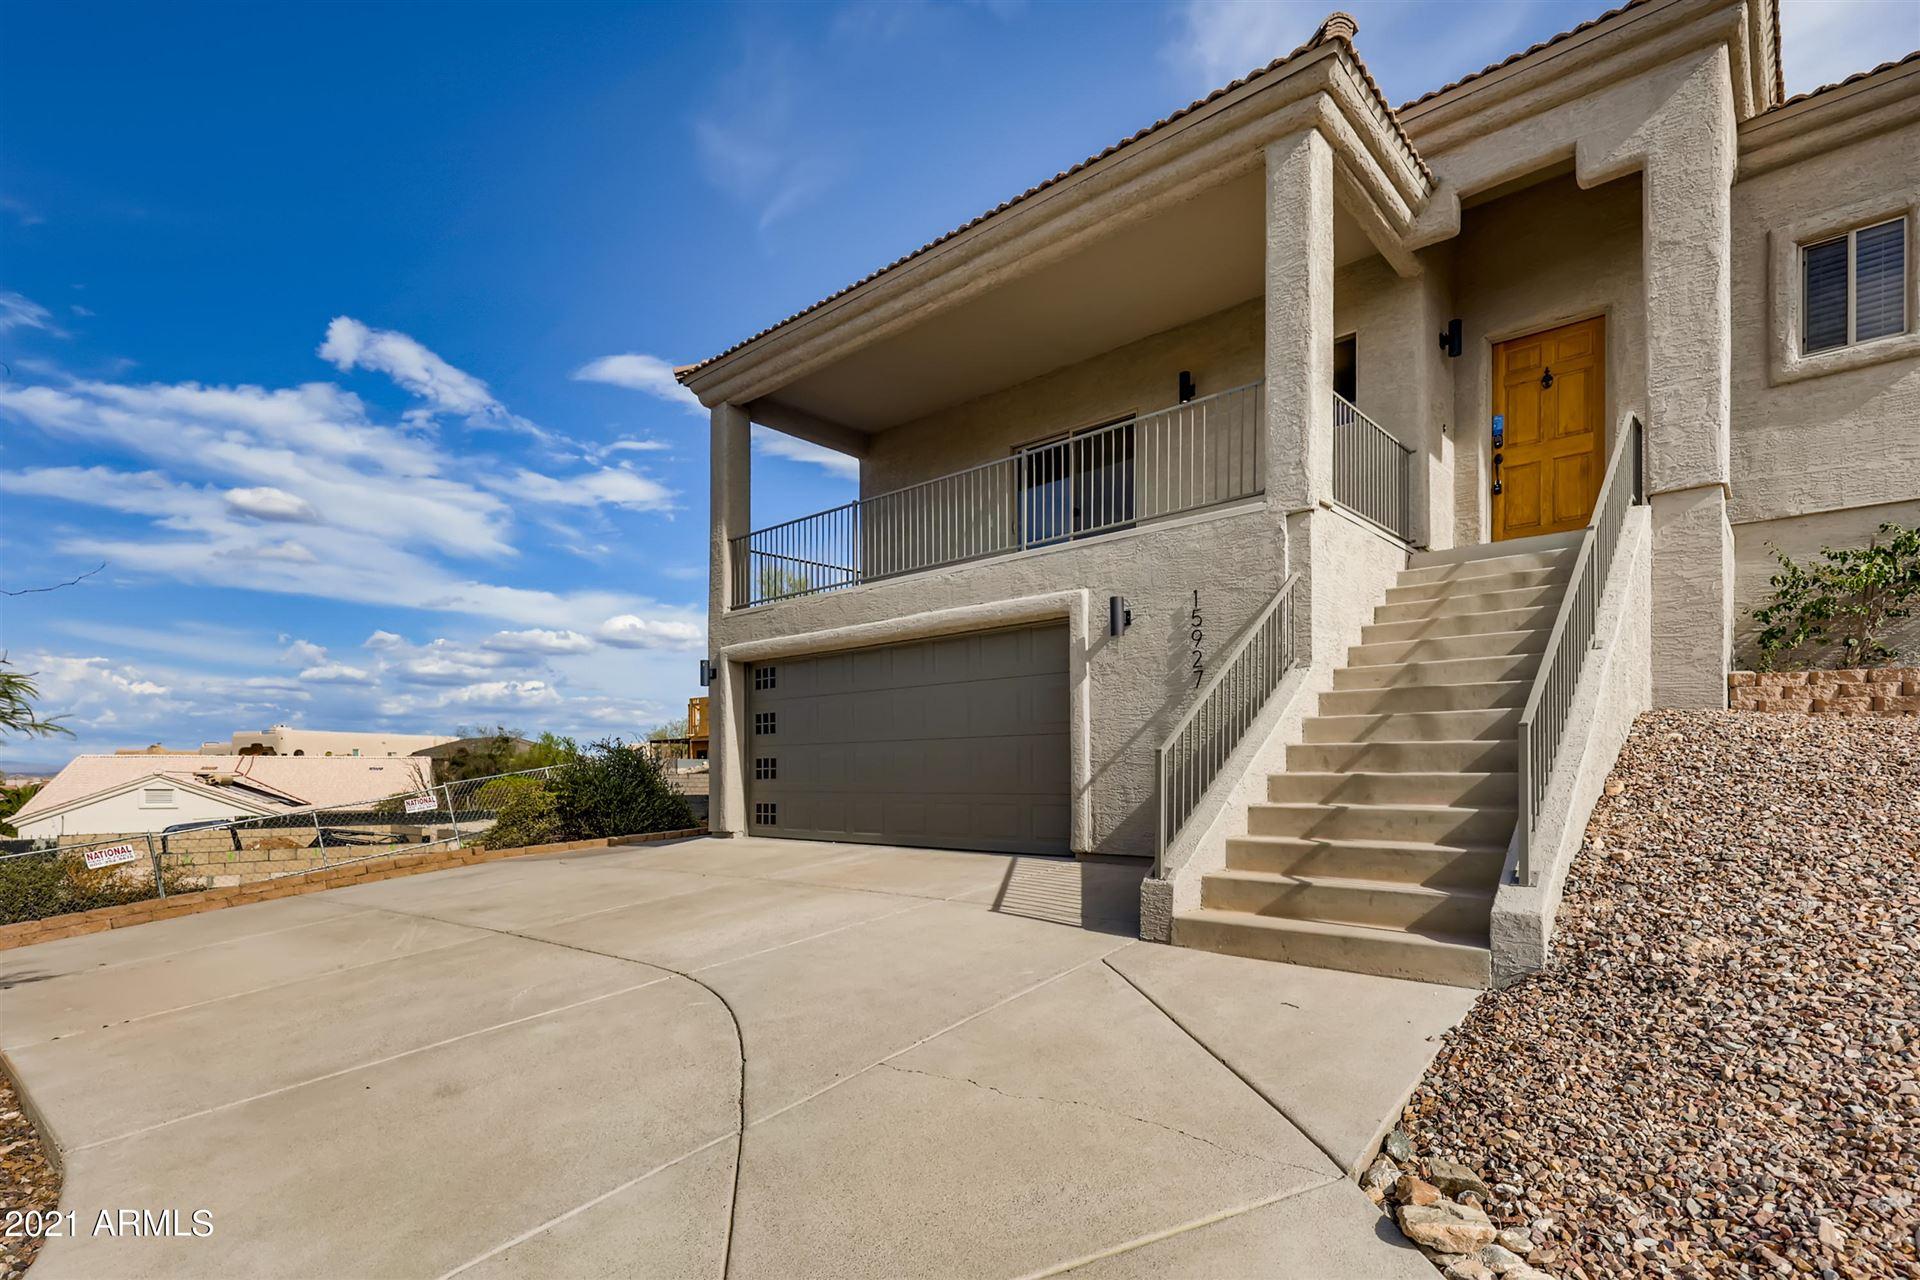 Photo of 15927 E PRIMROSE Drive, Fountain Hills, AZ 85268 (MLS # 6266881)